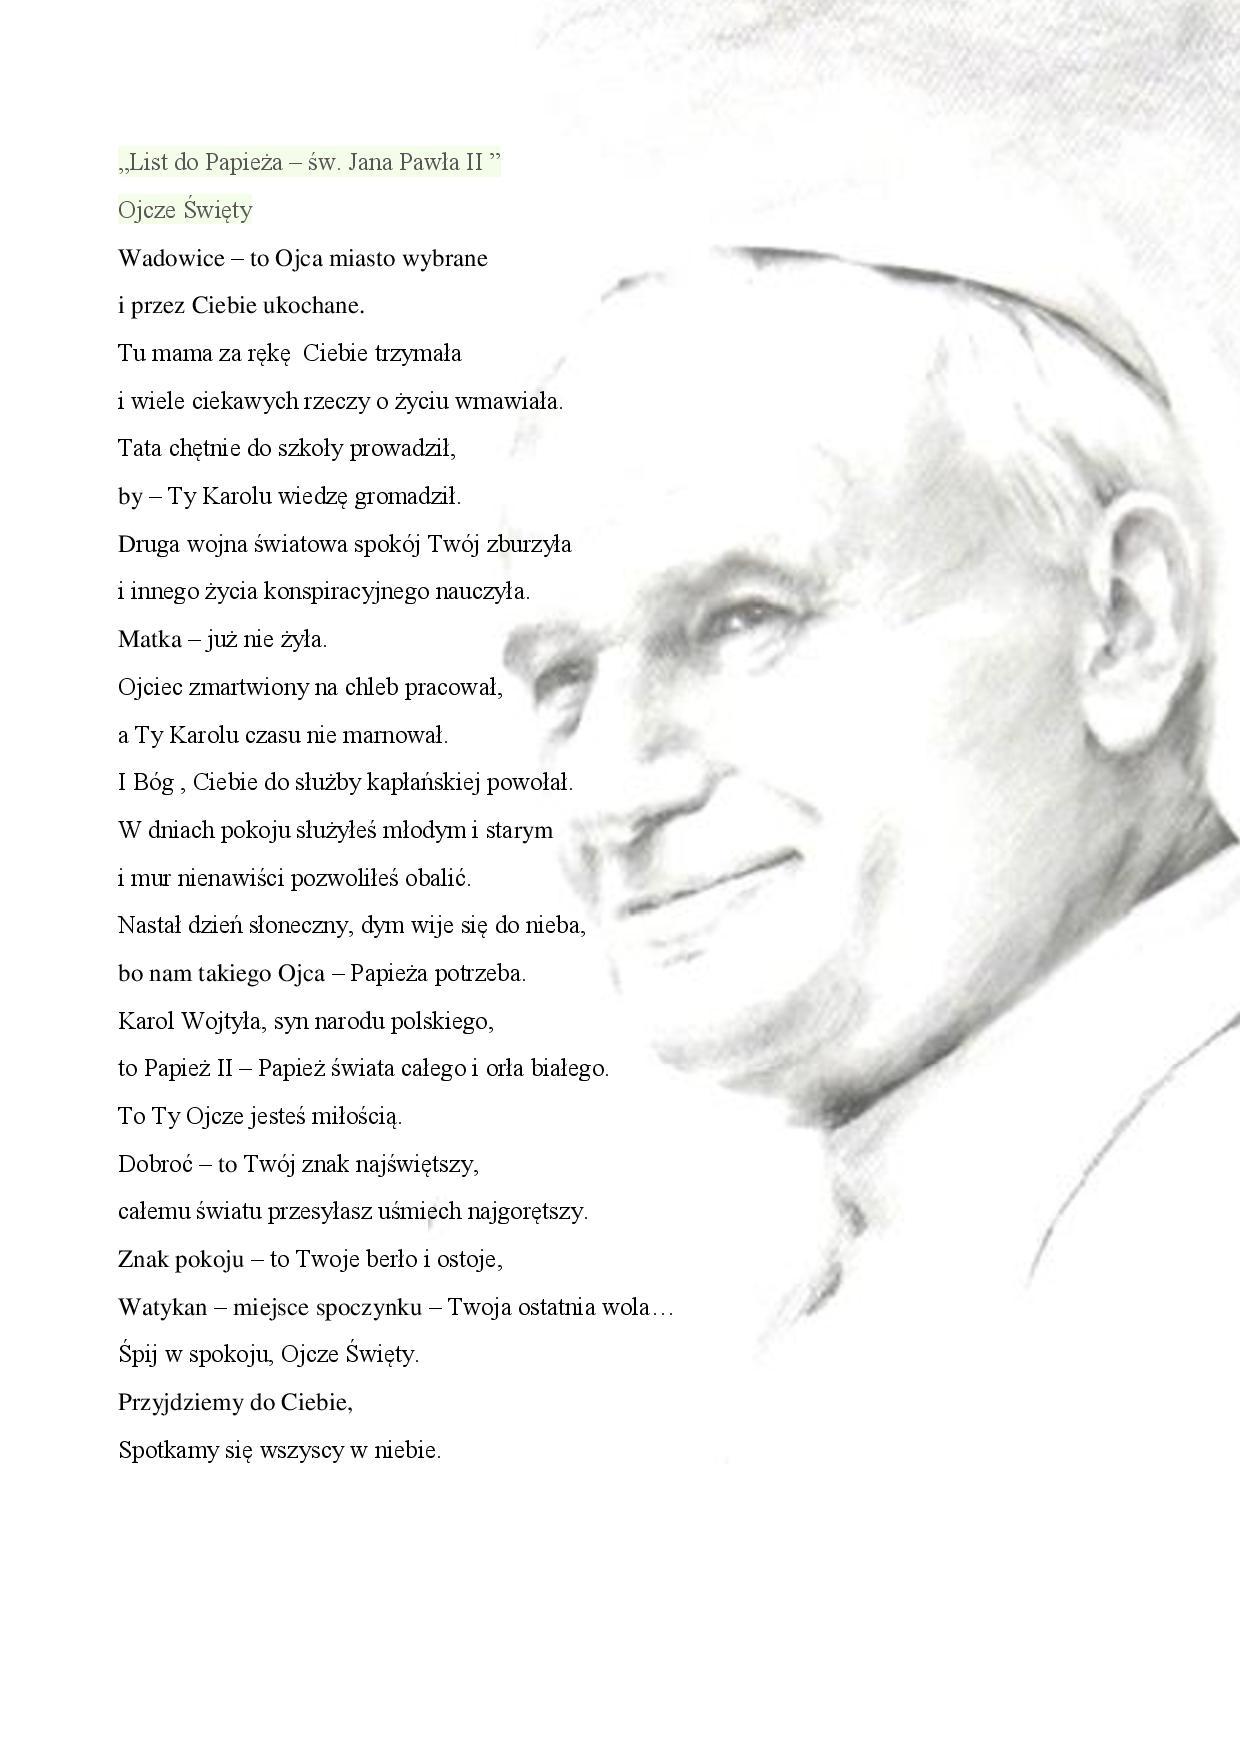 List do Papieża julia-1-page-001